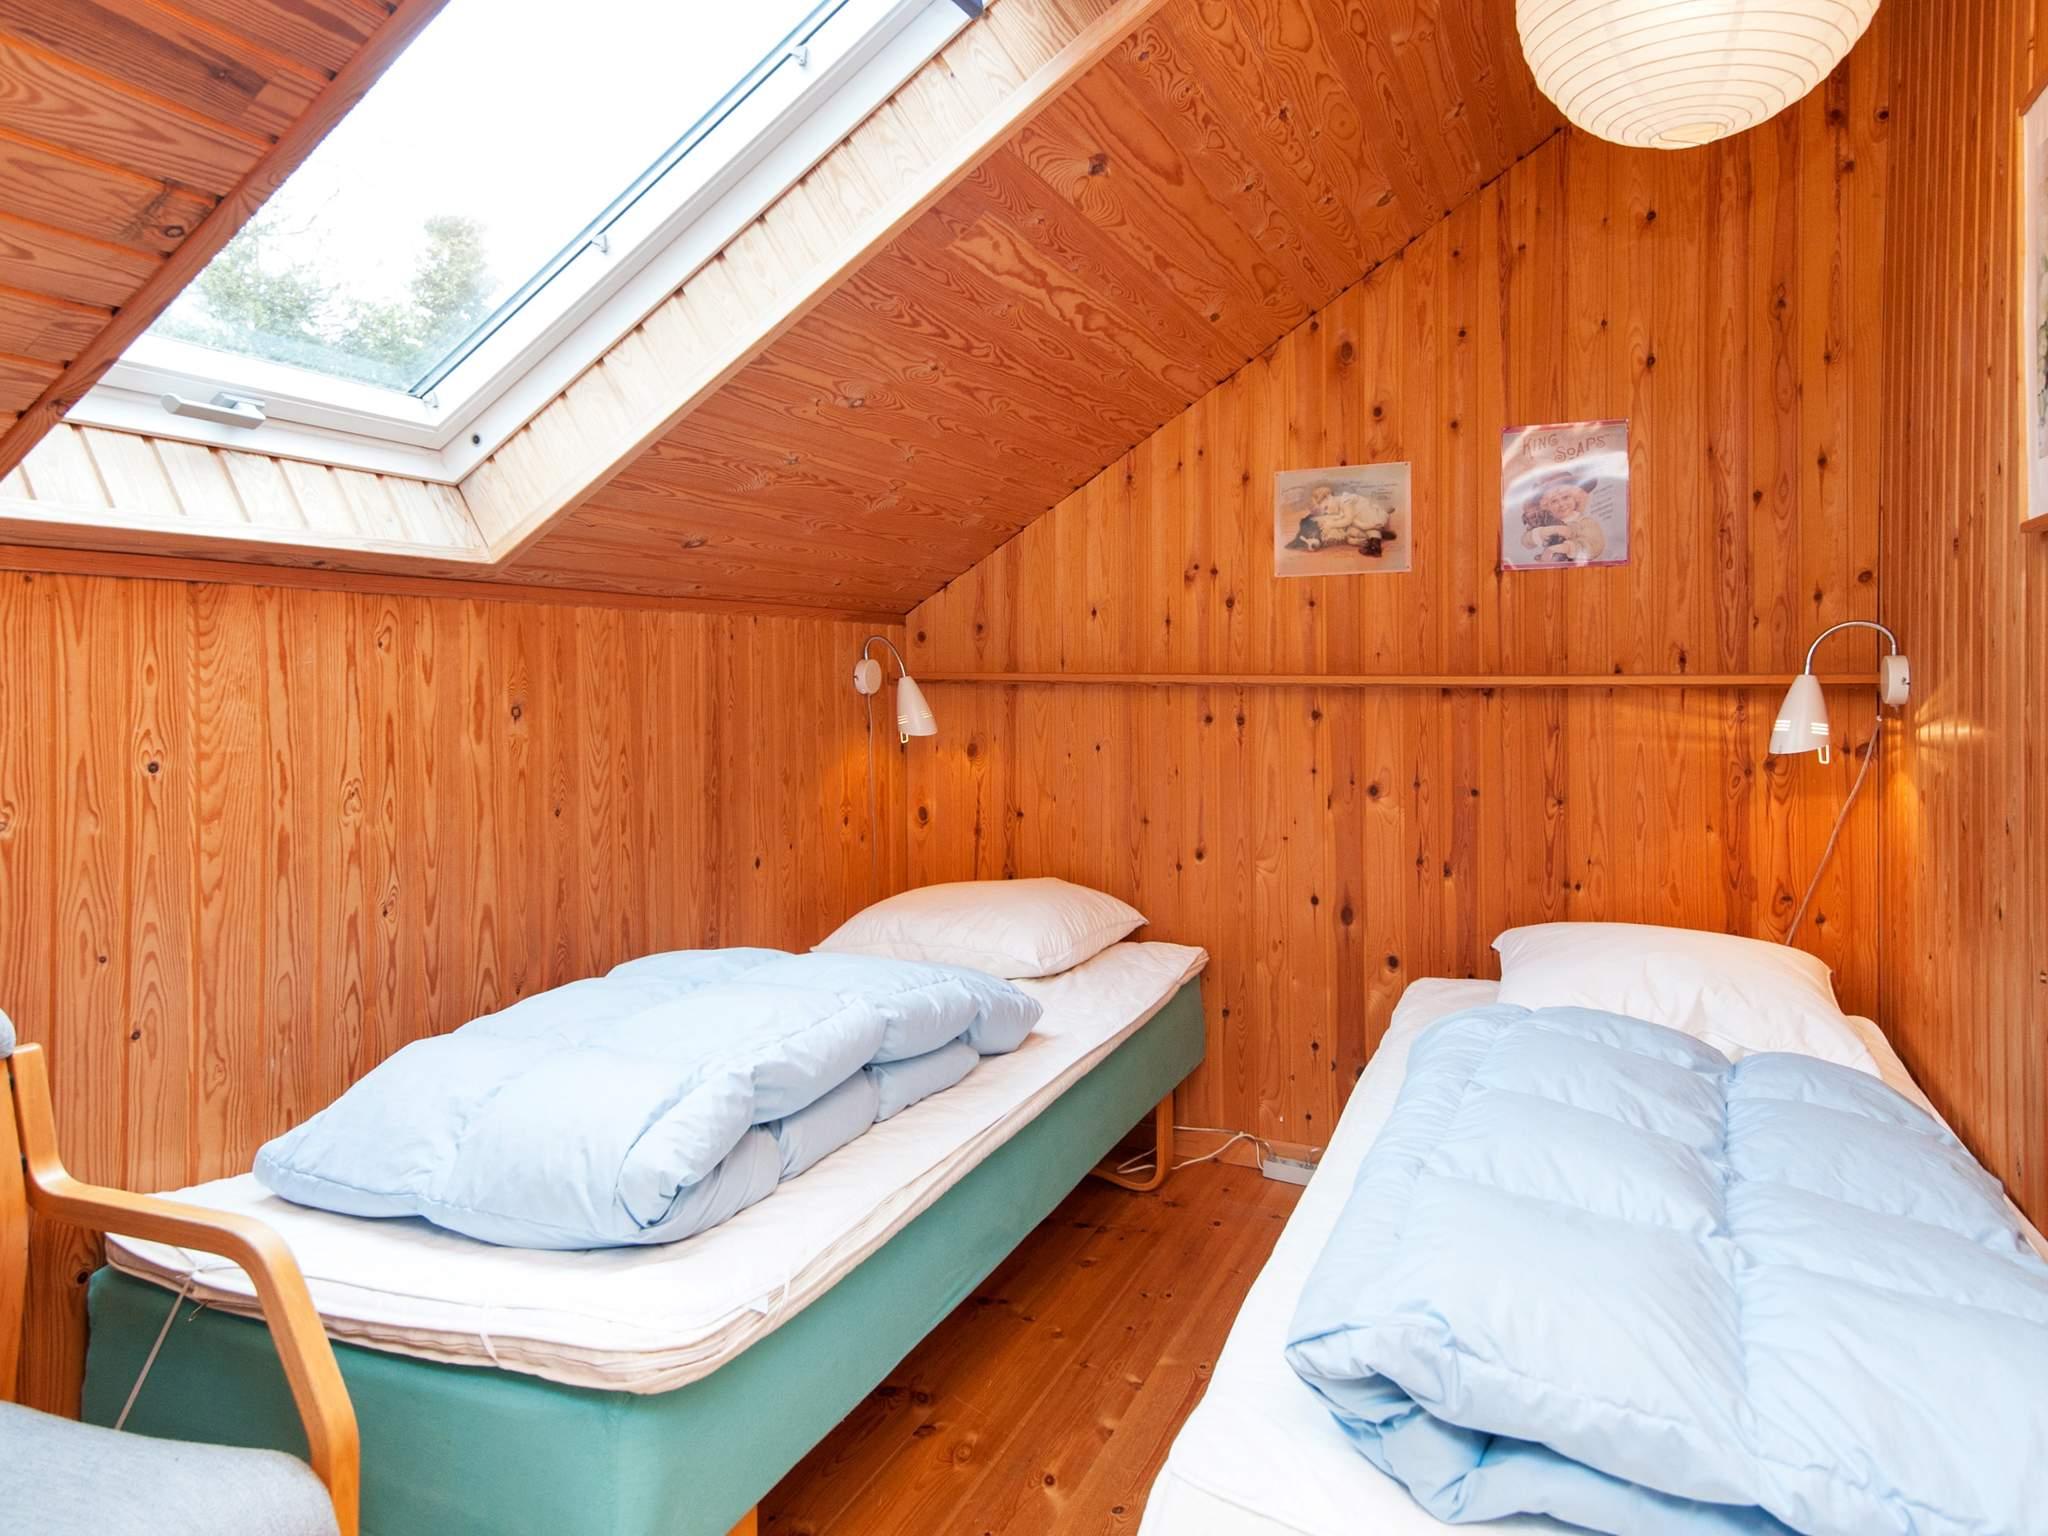 Ferienhaus Ry (83836), Ry, , Ostjütland, Dänemark, Bild 5